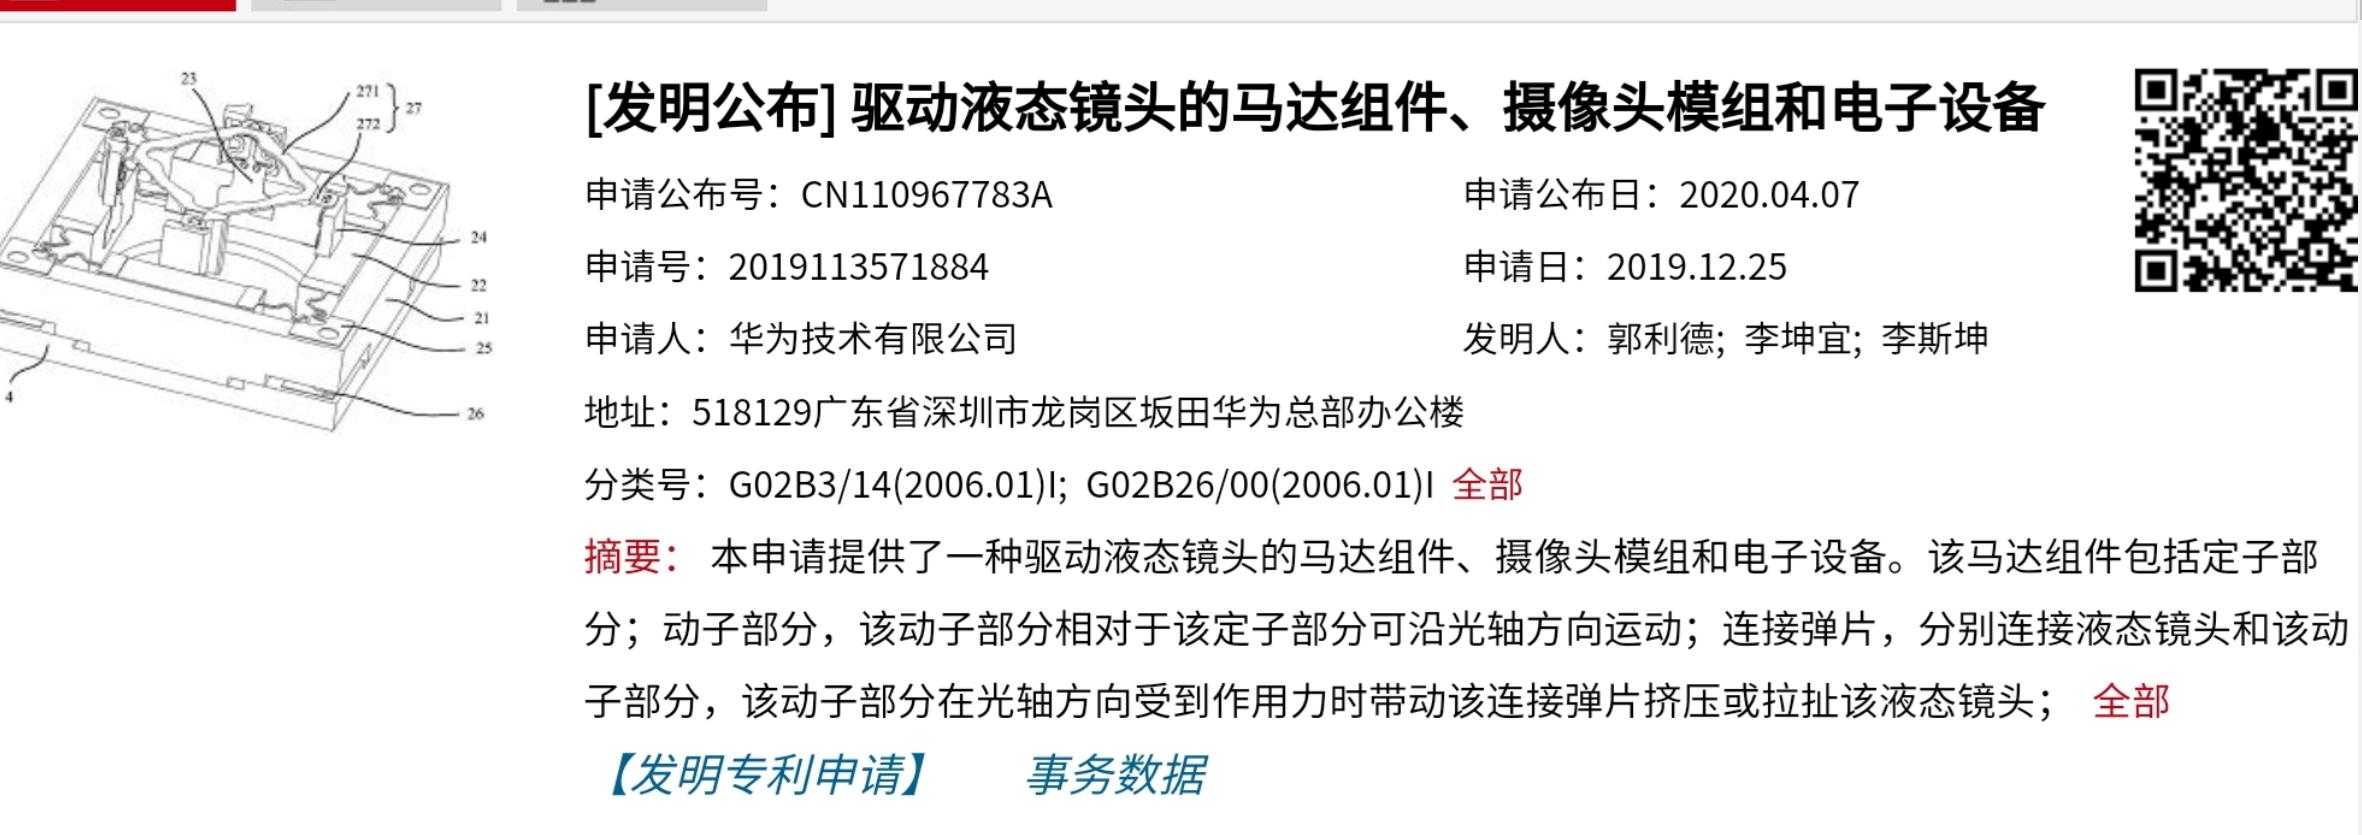 QQ截图20201012113425.png